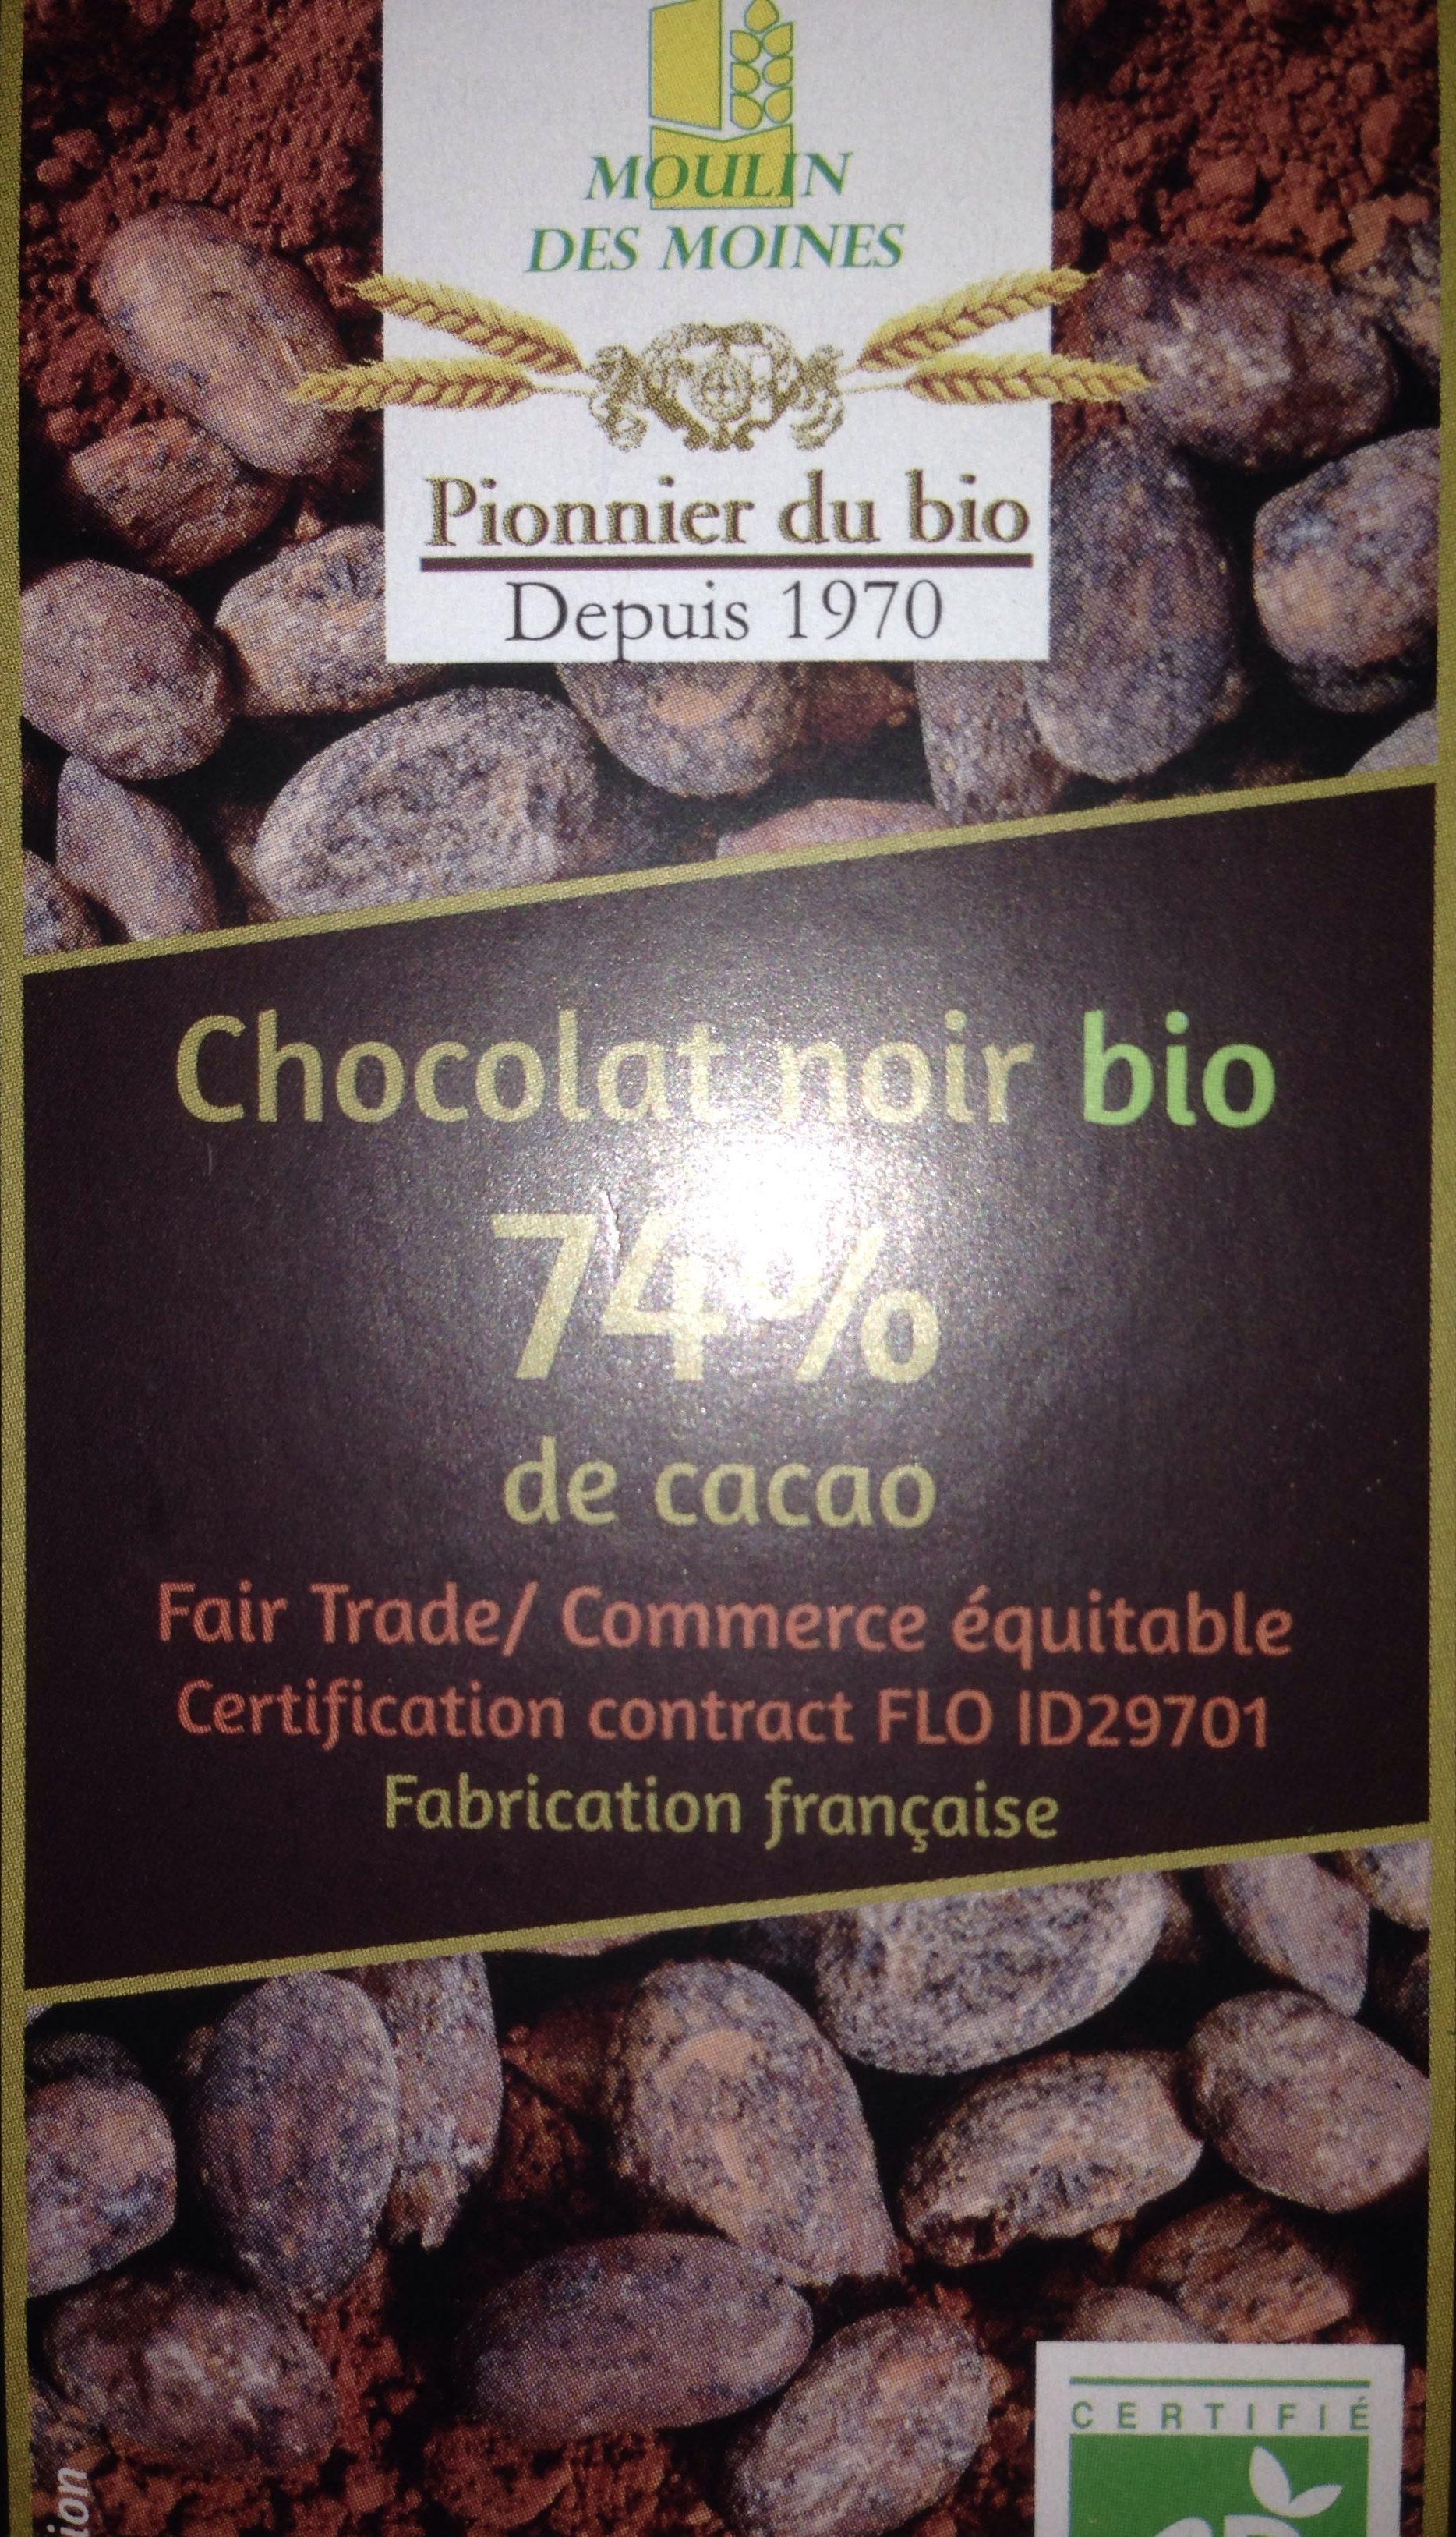 Chocolat noir bio 74% de cacao - Product - fr